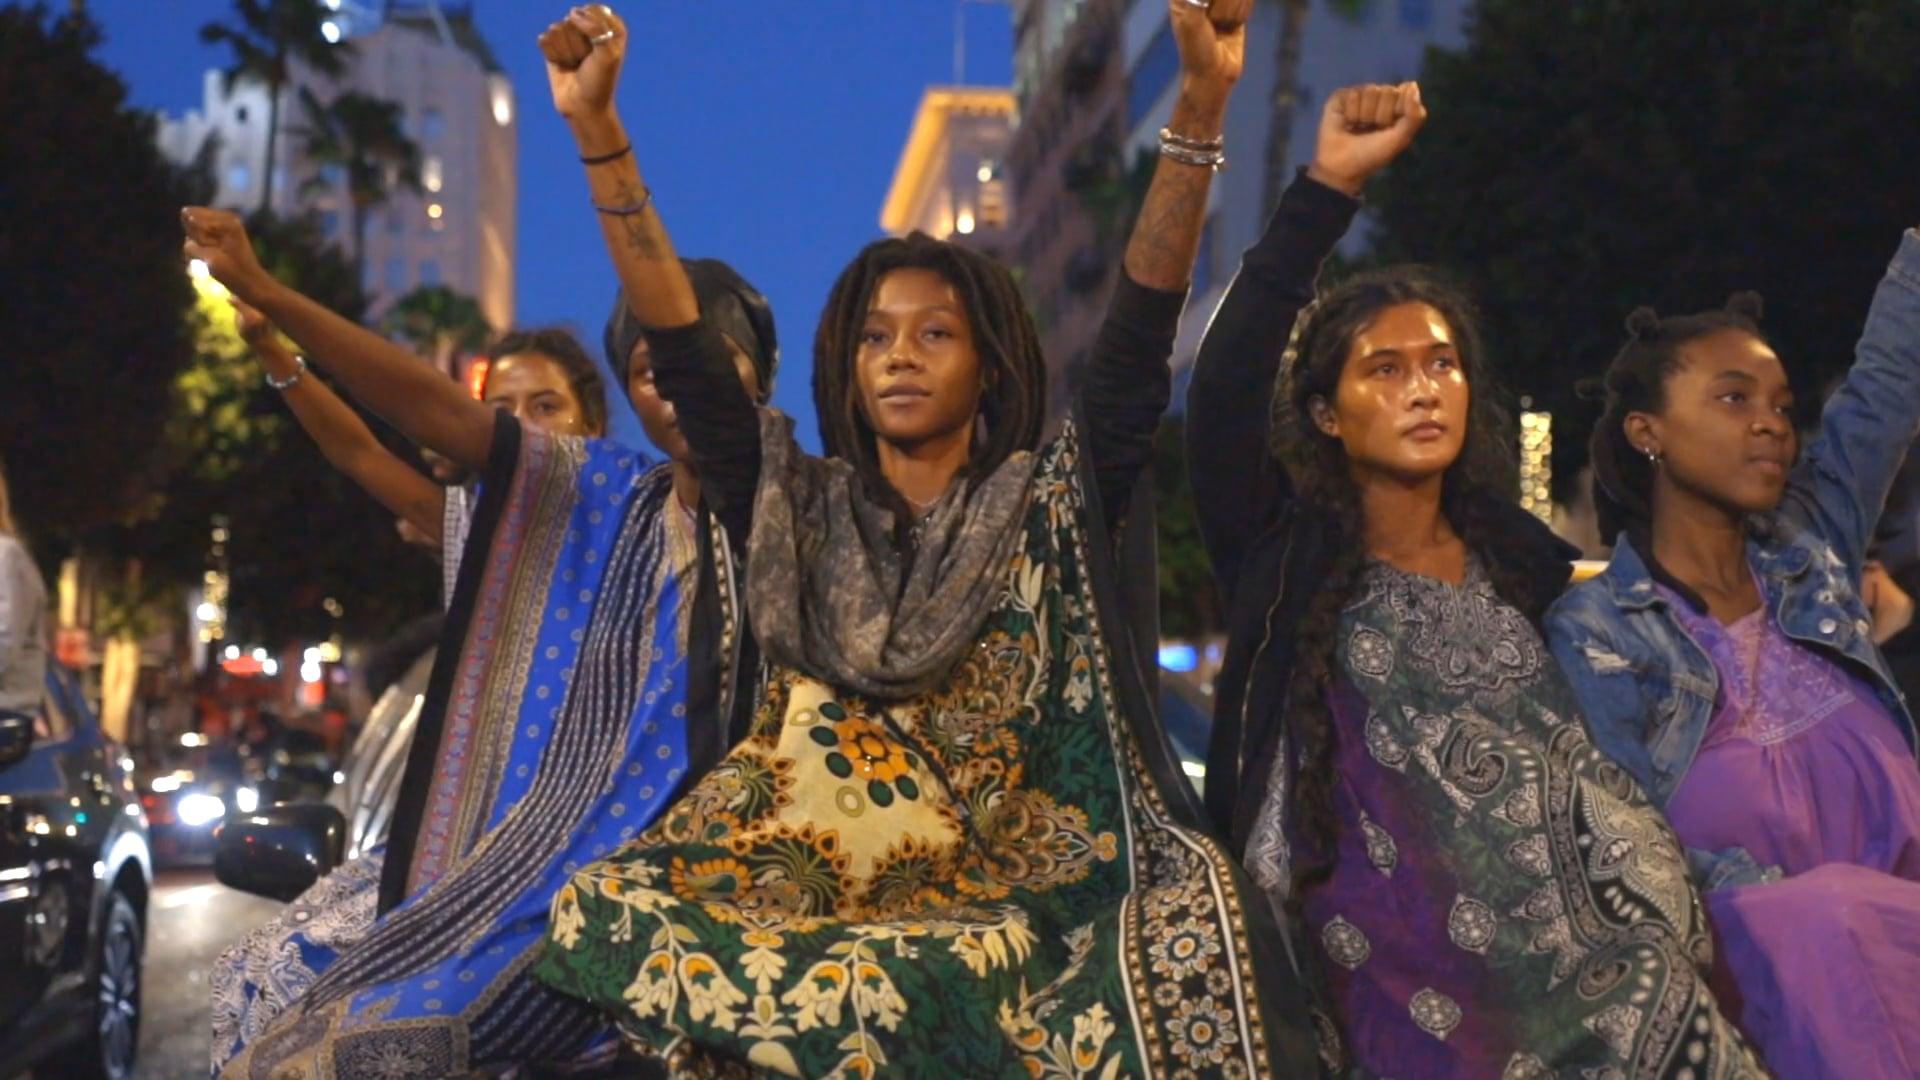 Black Lives Matter Community Protest - Hollywood, Ca